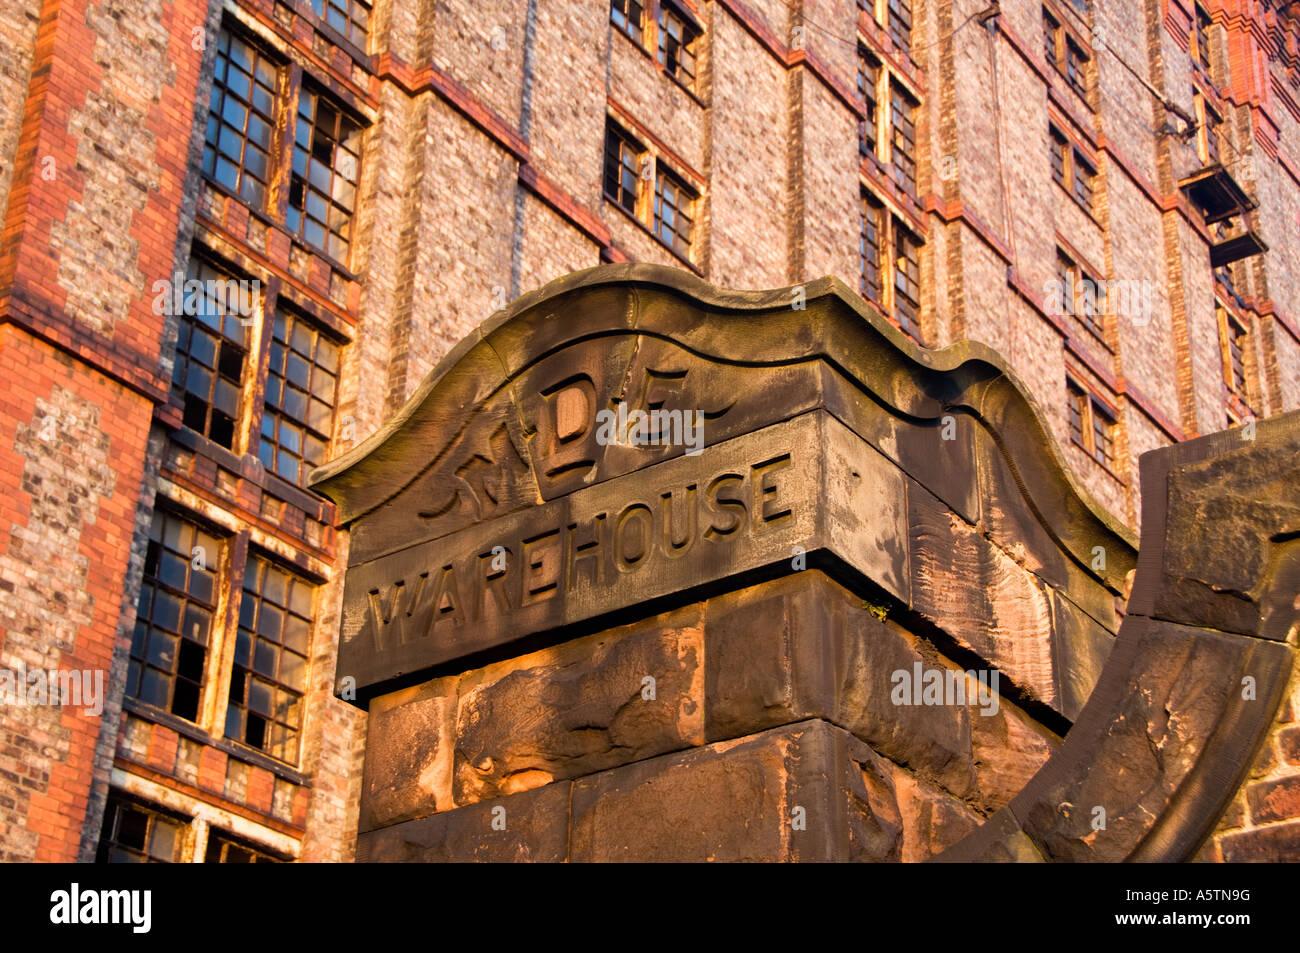 Old Tobacco Warehouse, Stanley Dock, Liverpool, Merseyside, England, UK Stock Photo